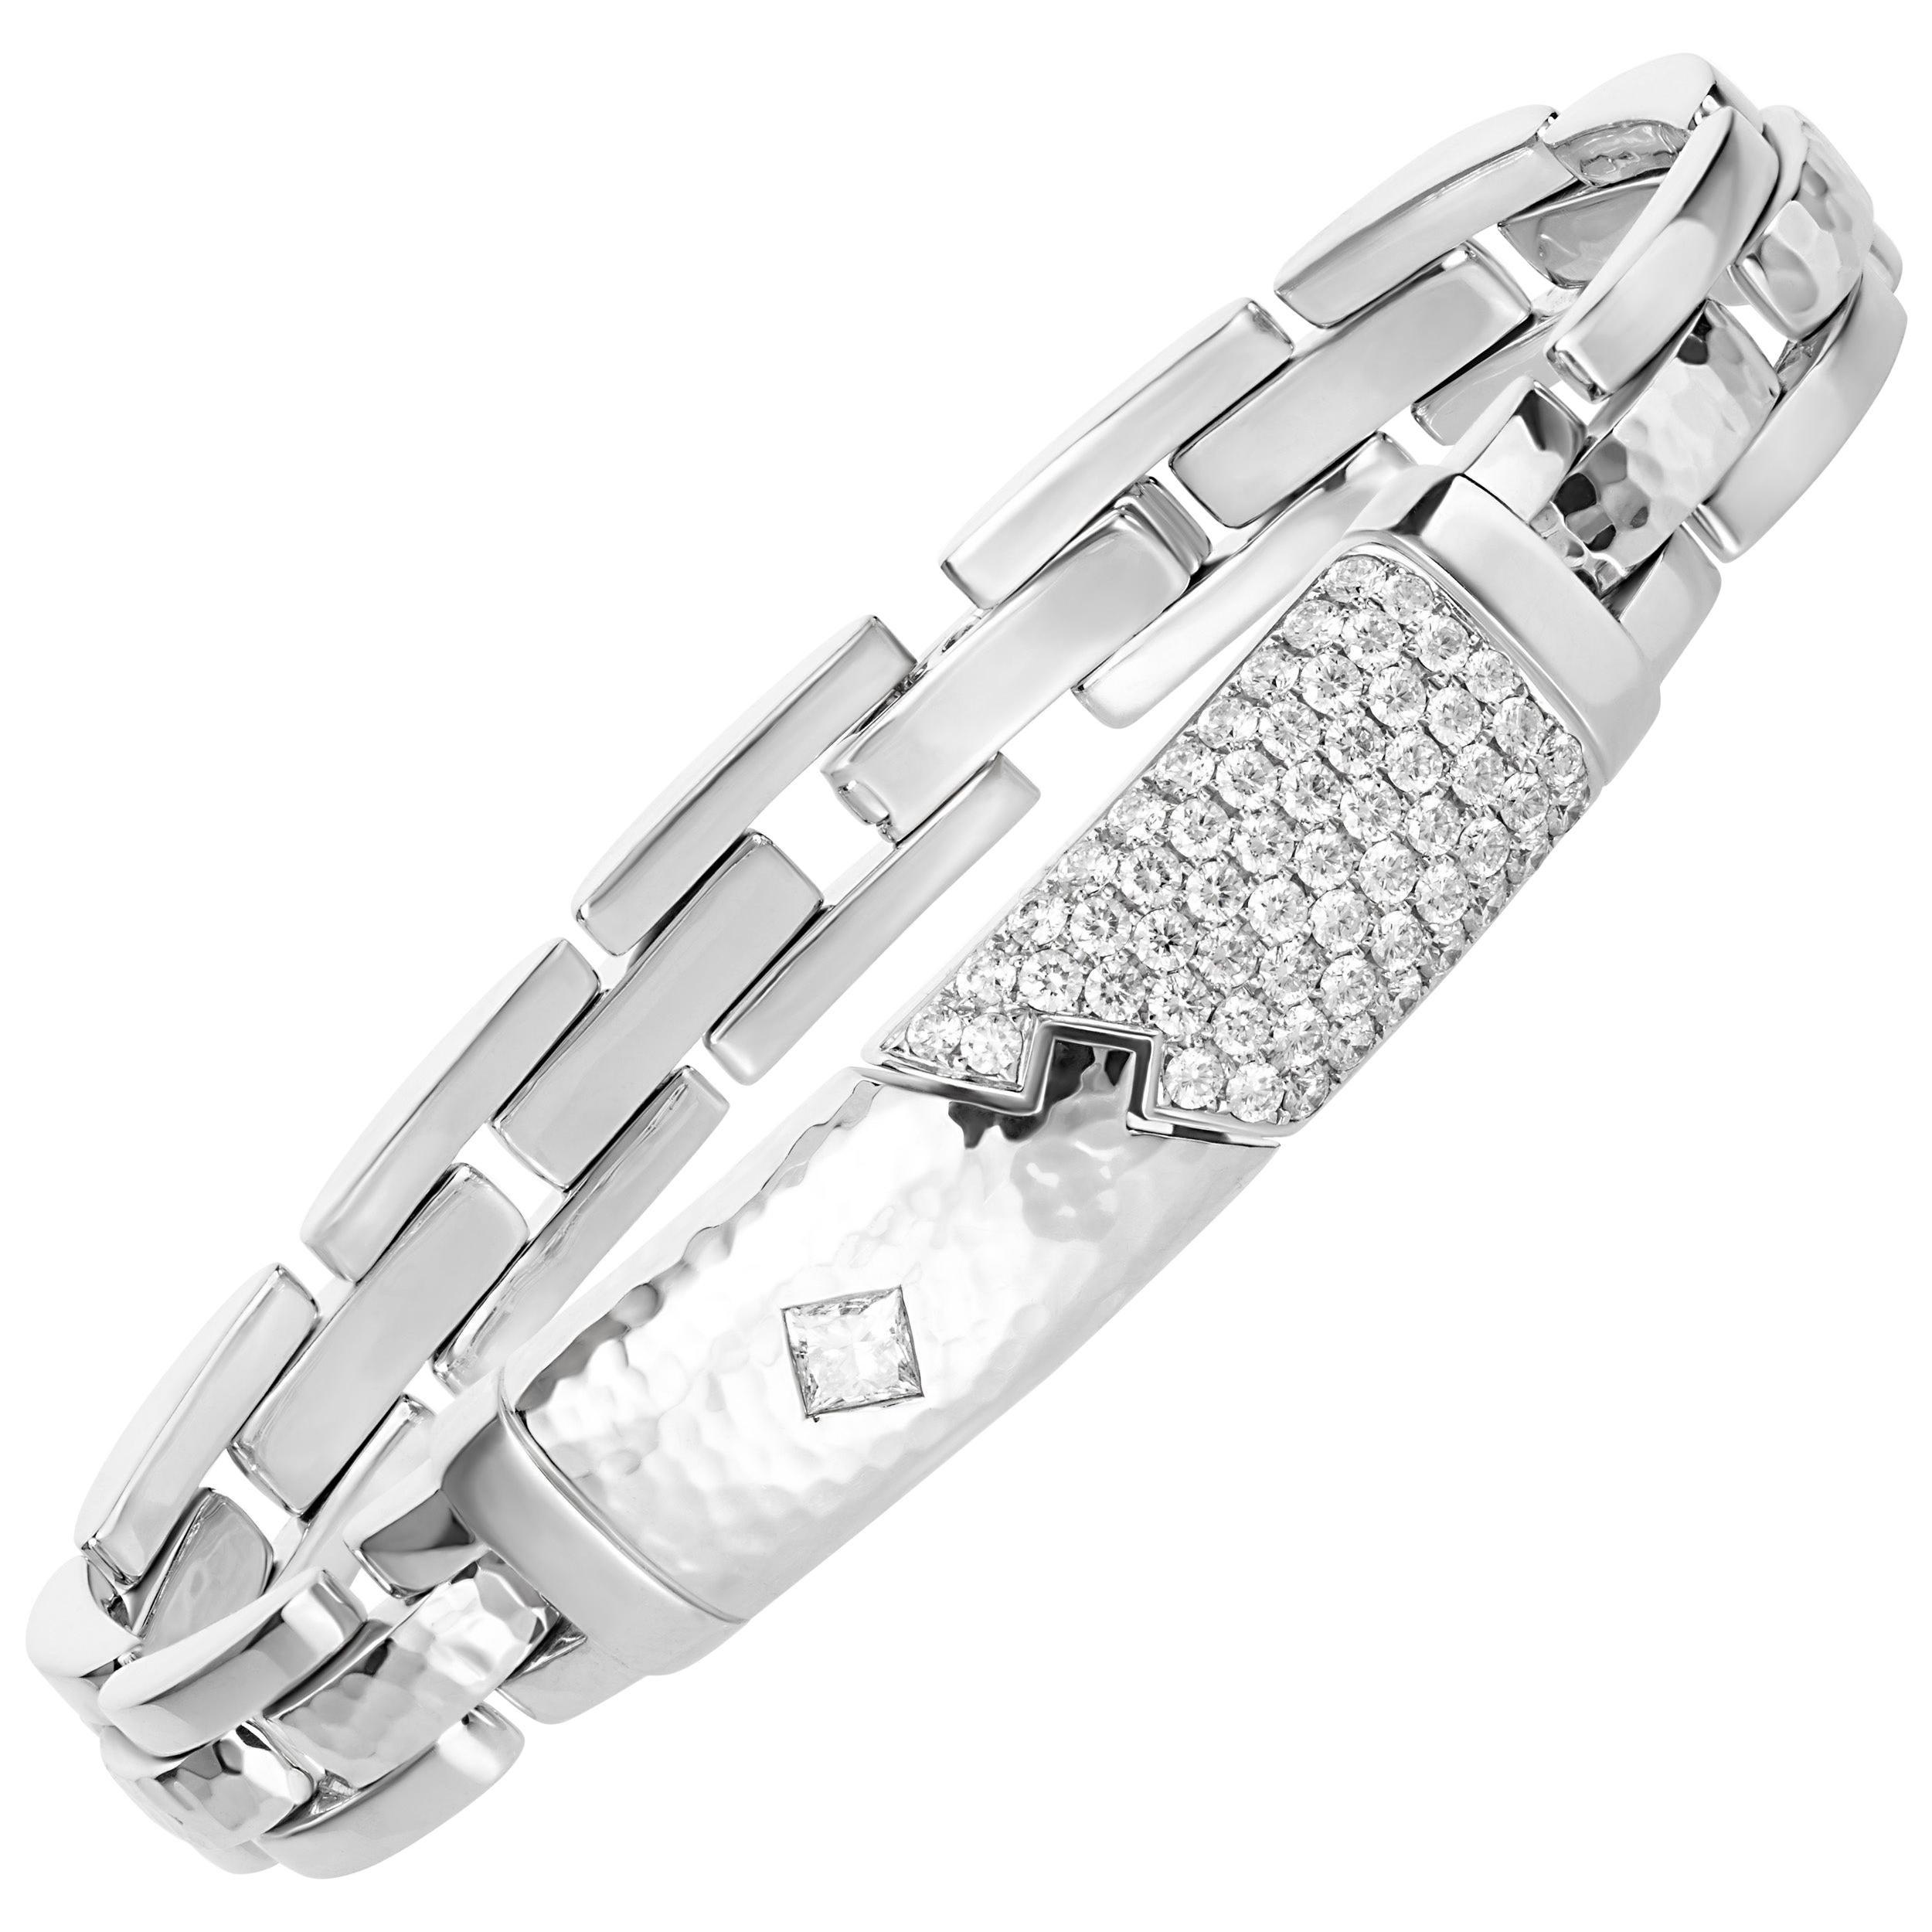 1.93 Carat Princess Brilliant Cut Diamond 18 Karat White Gold Link Bracelet